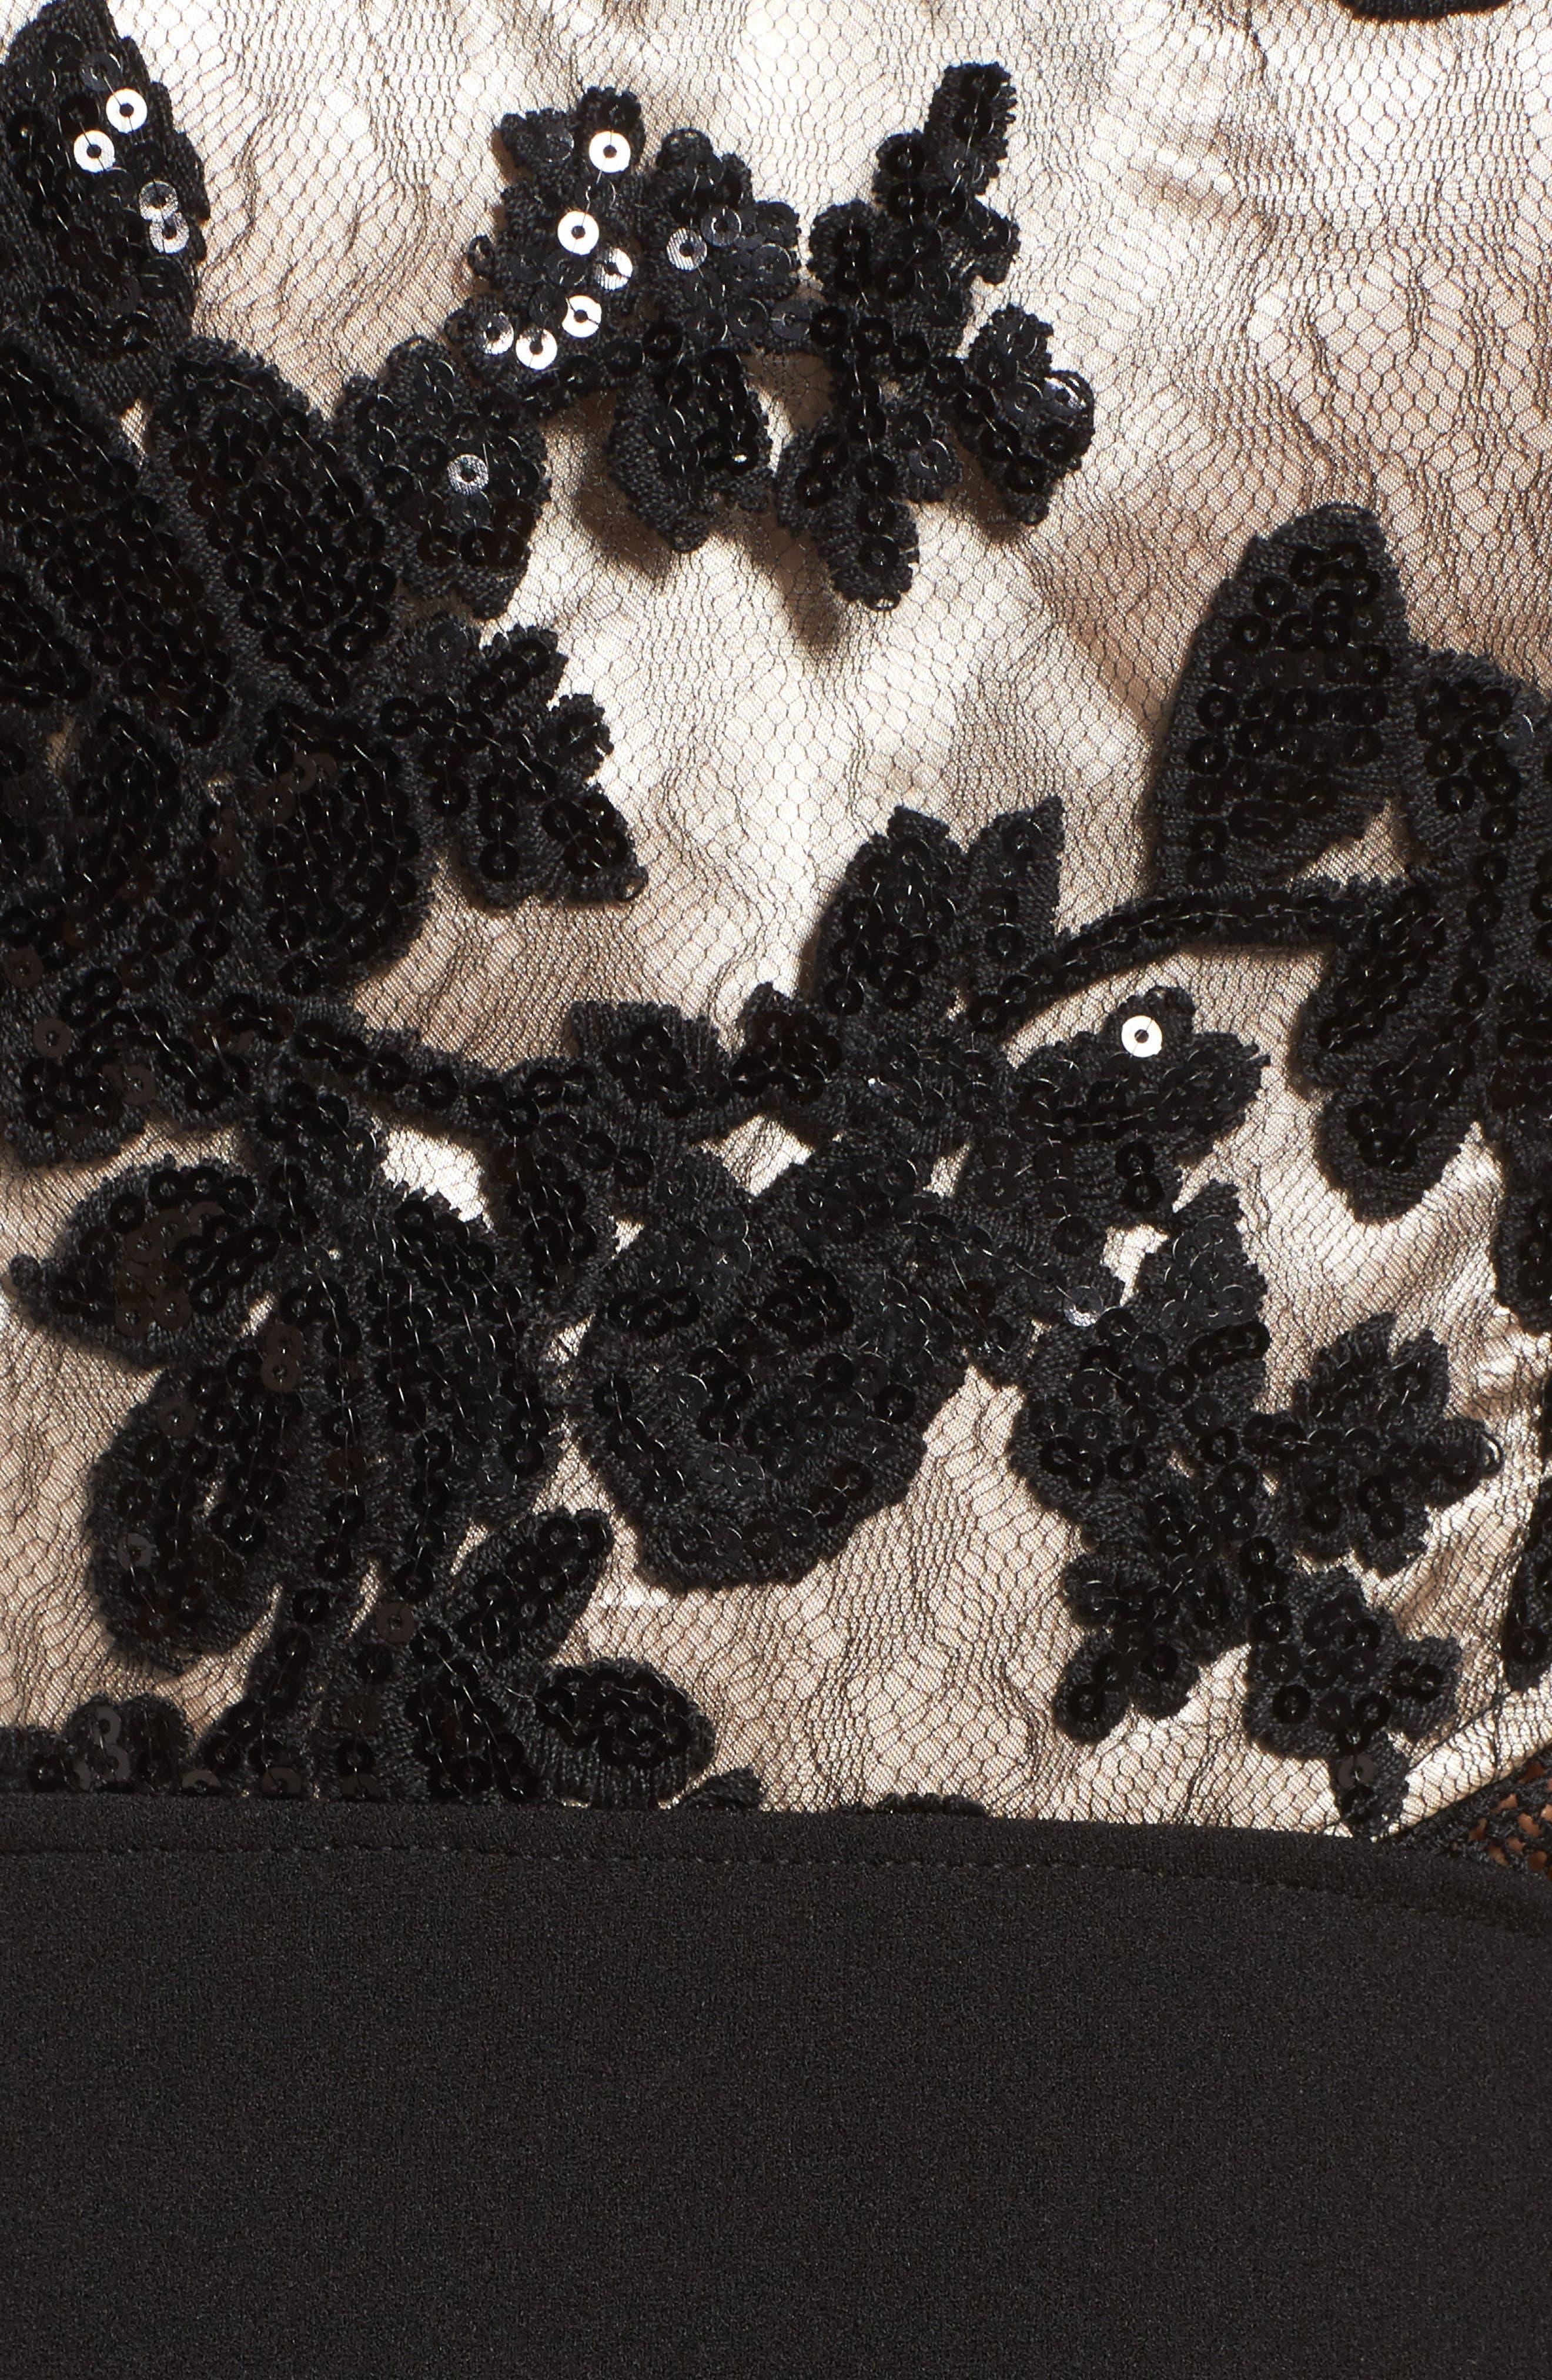 Cutout Embellished Lace & Scuba Gown,                             Alternate thumbnail 5, color,                             Black/ Champagne